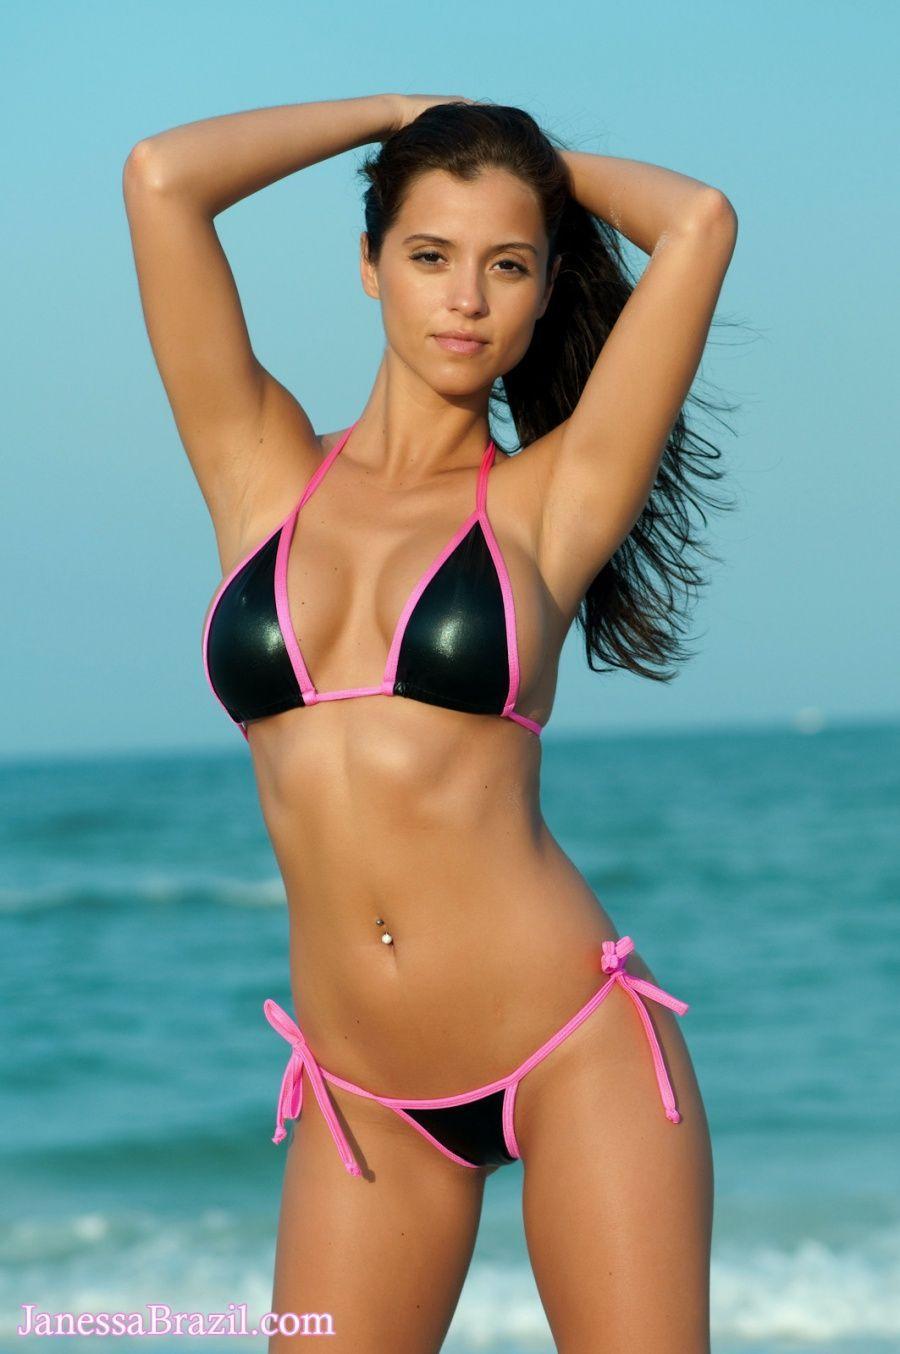 Bikini brand brazilian phrase possible